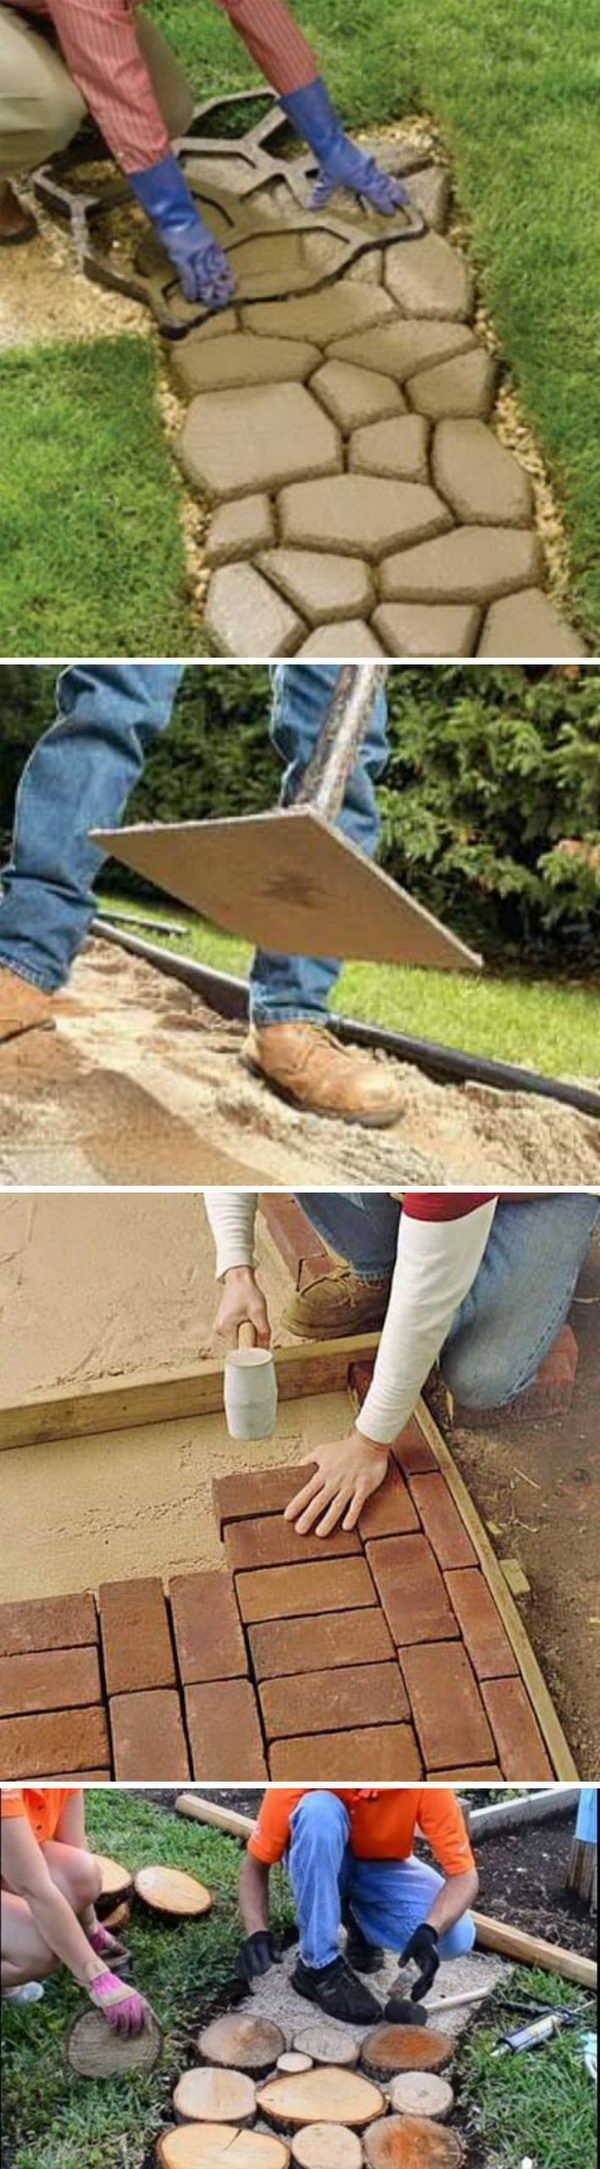 Creative Pathway & Walkway Ideas For Your Garden Designs.